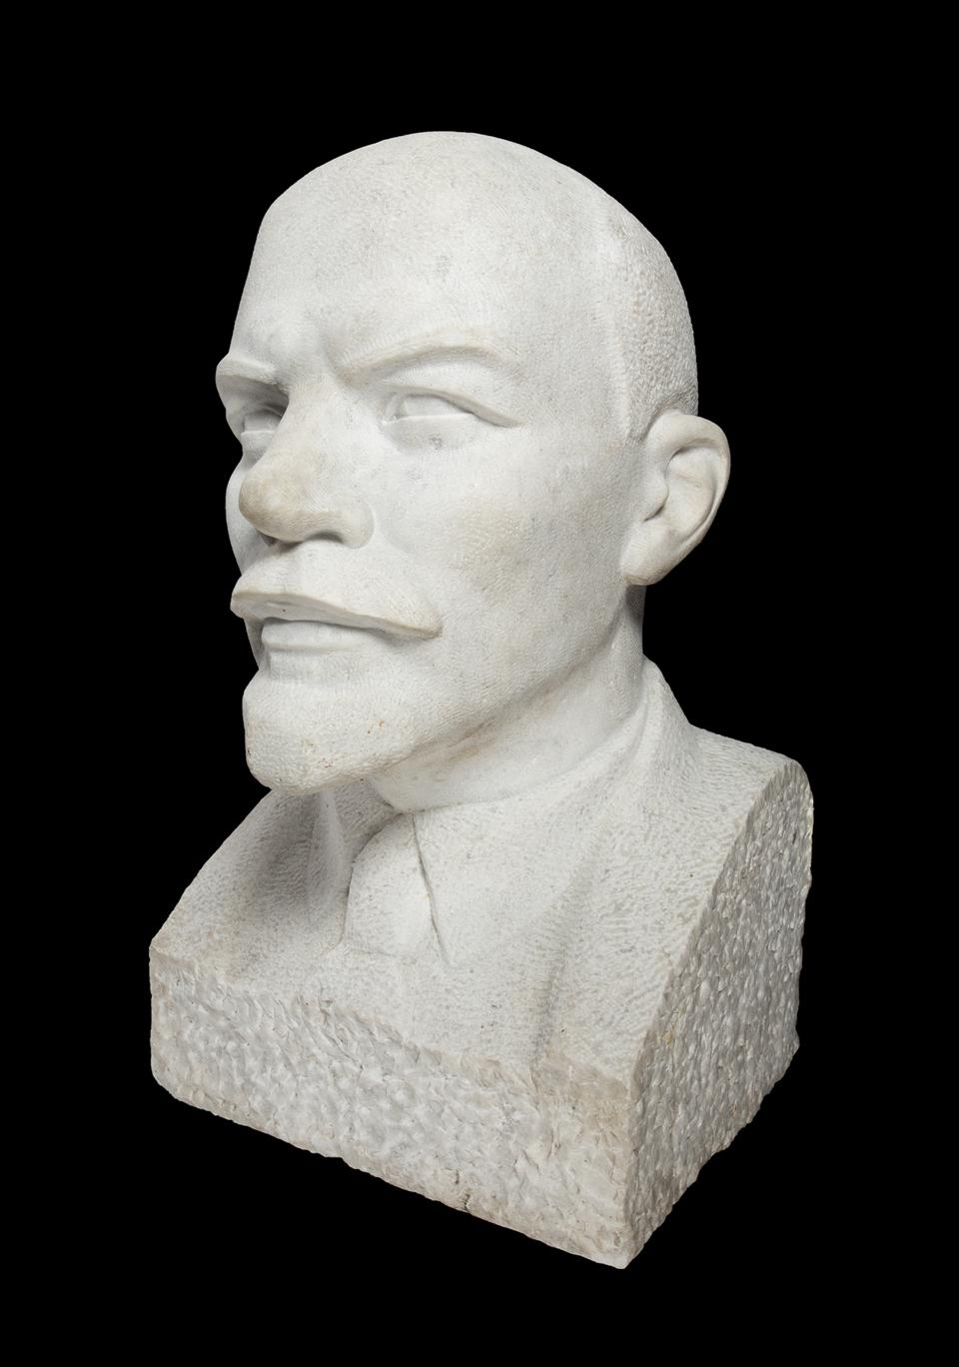 A white granite bust of Lenin that stood outside the Kaliningrad KGB headquarters.